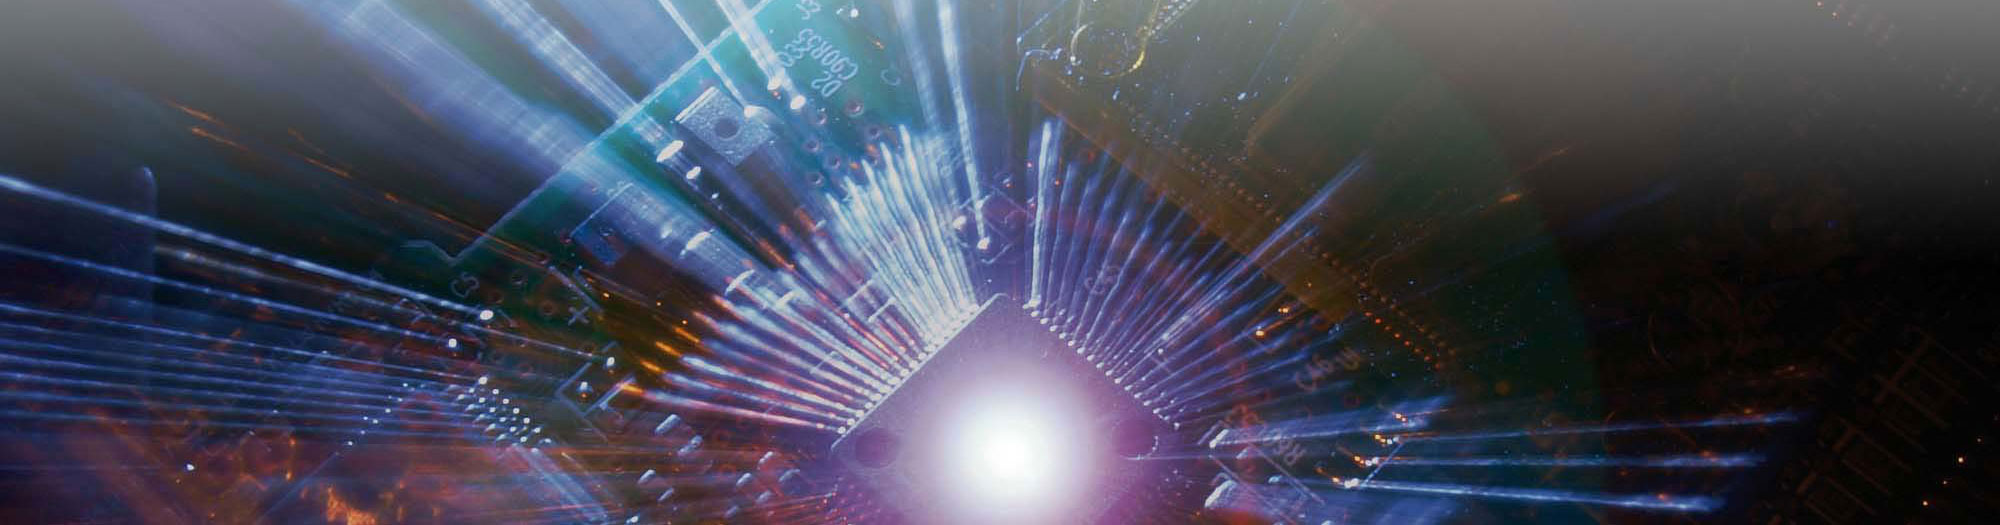 Laser Micromachining